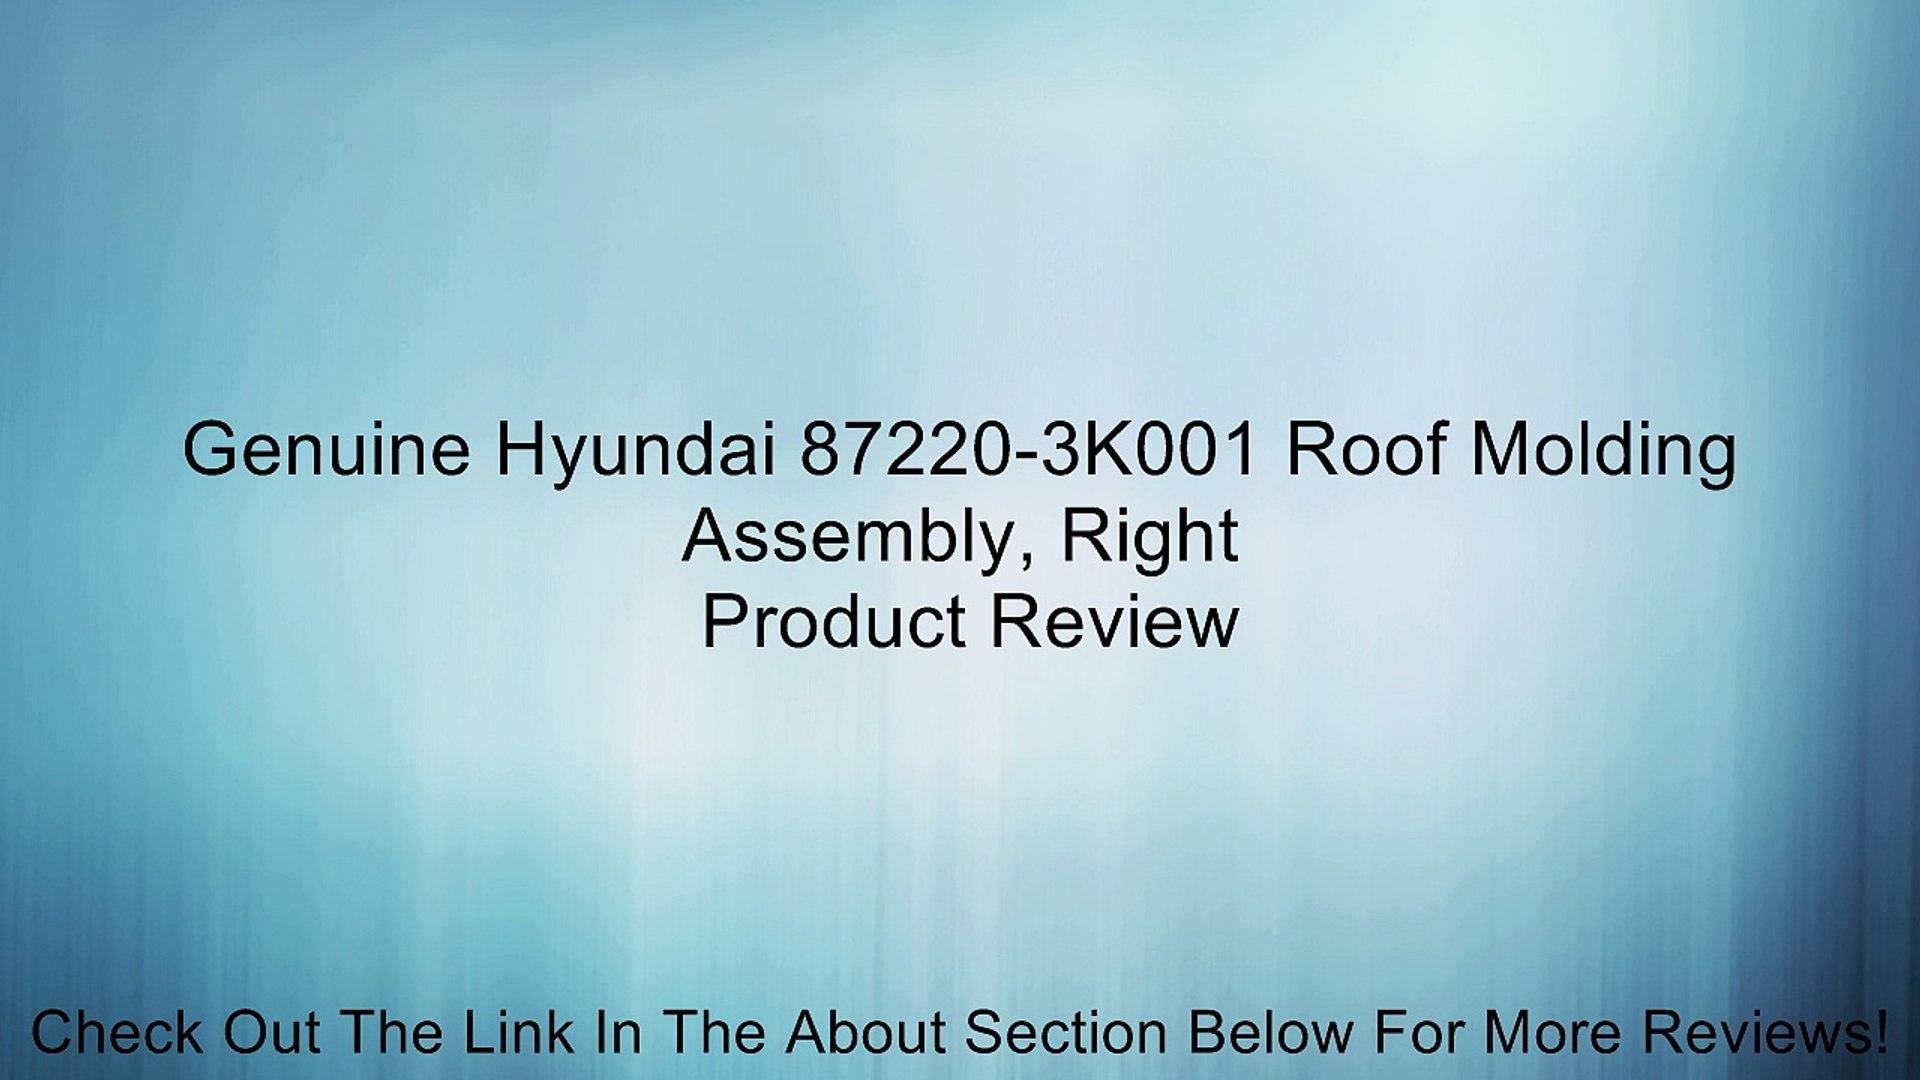 TOYOTA 7576508012 GENUINE OEM WINDOW MOLDING